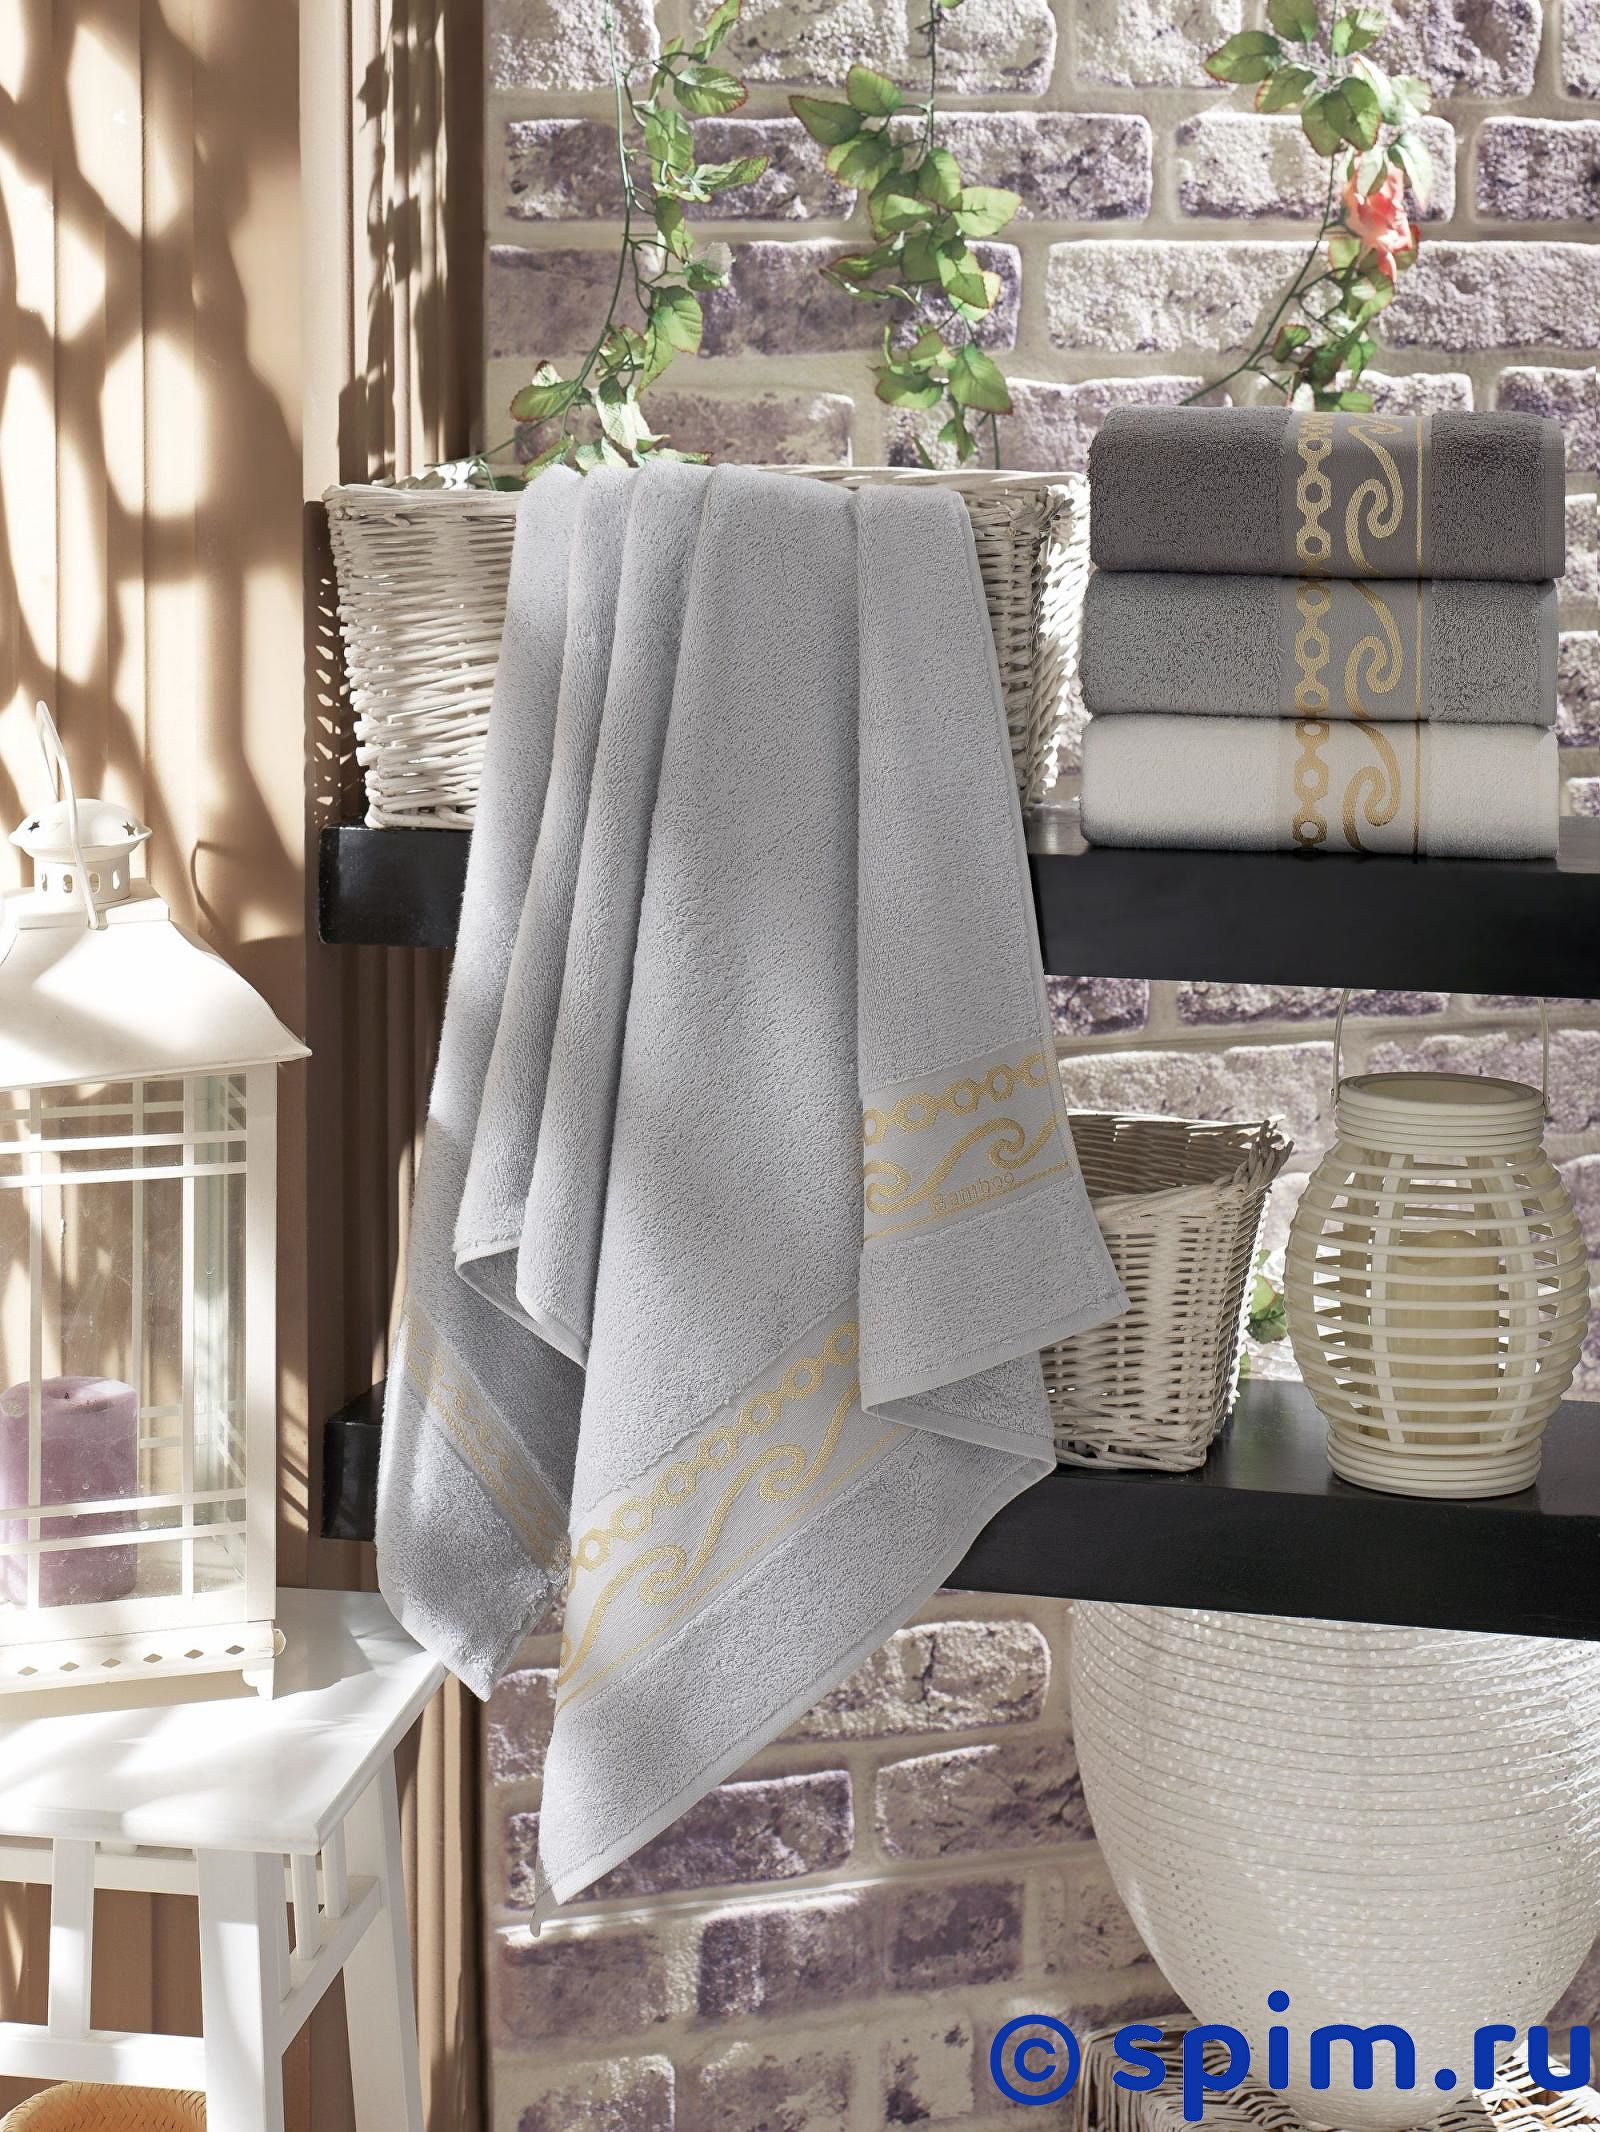 Набор из 4-х полотенец Do&co Freesia 50х90 см полотенца do n co полотенце lady цвет мятный набор